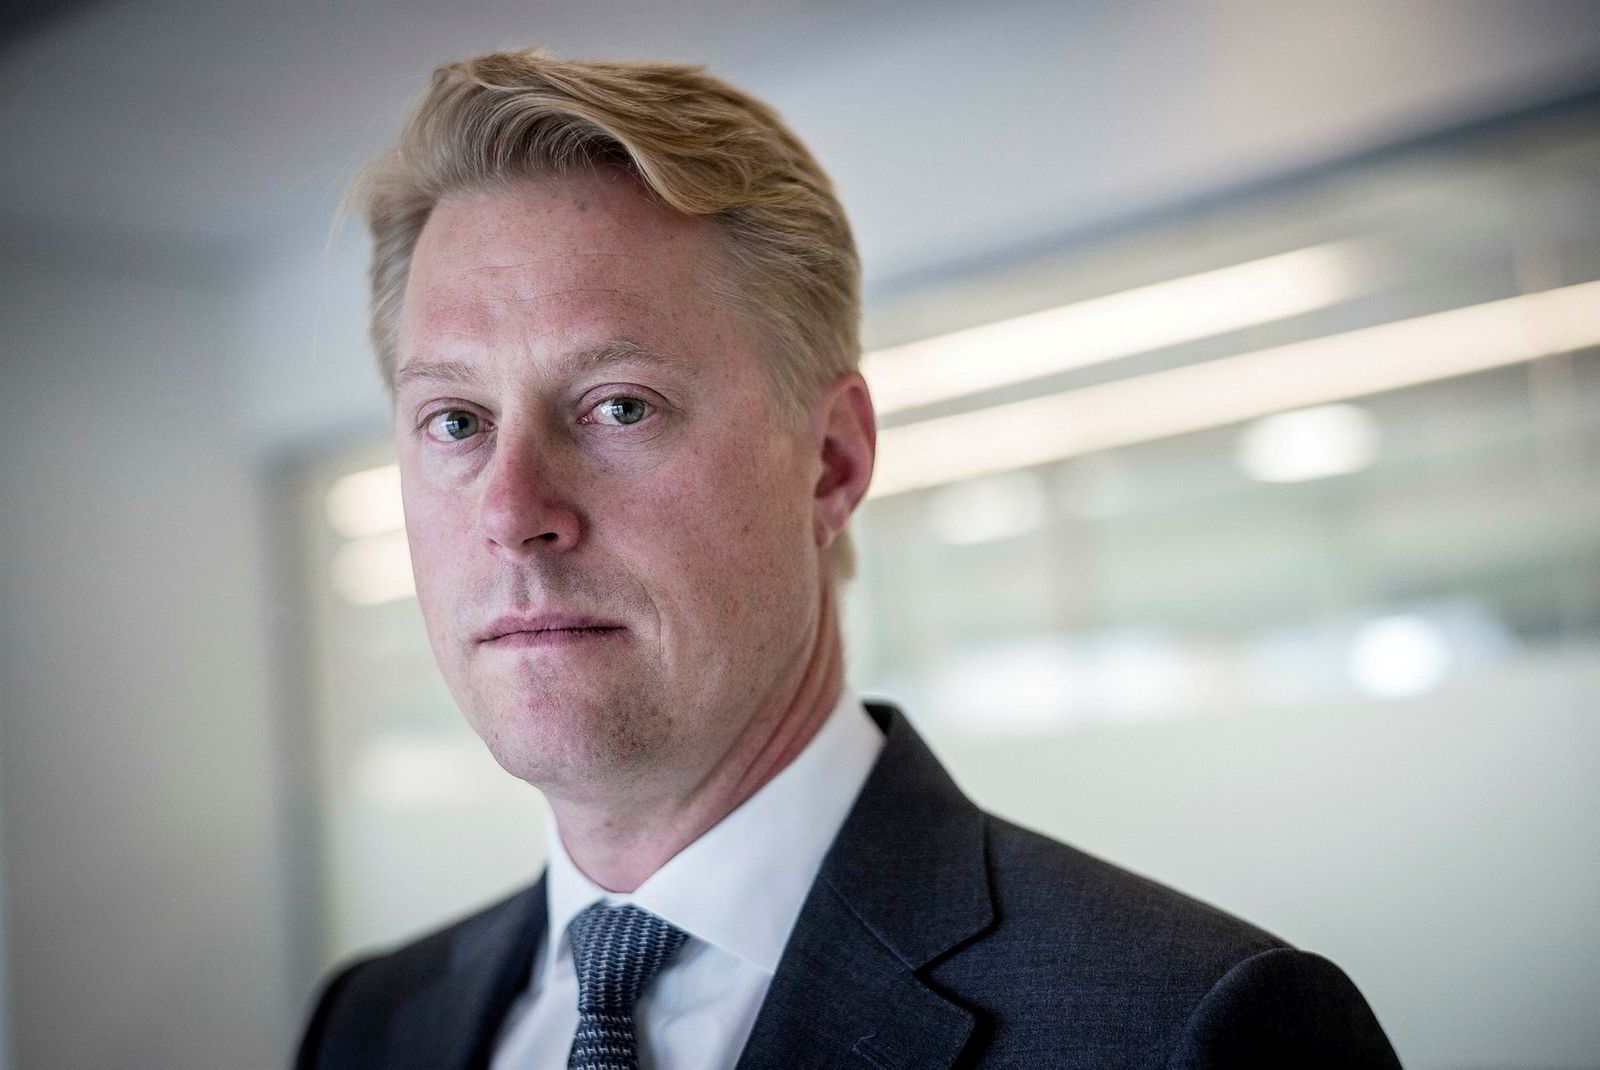 Thor Johan Furuholmen er ifølge Kapital Norges 242. rikeste person.